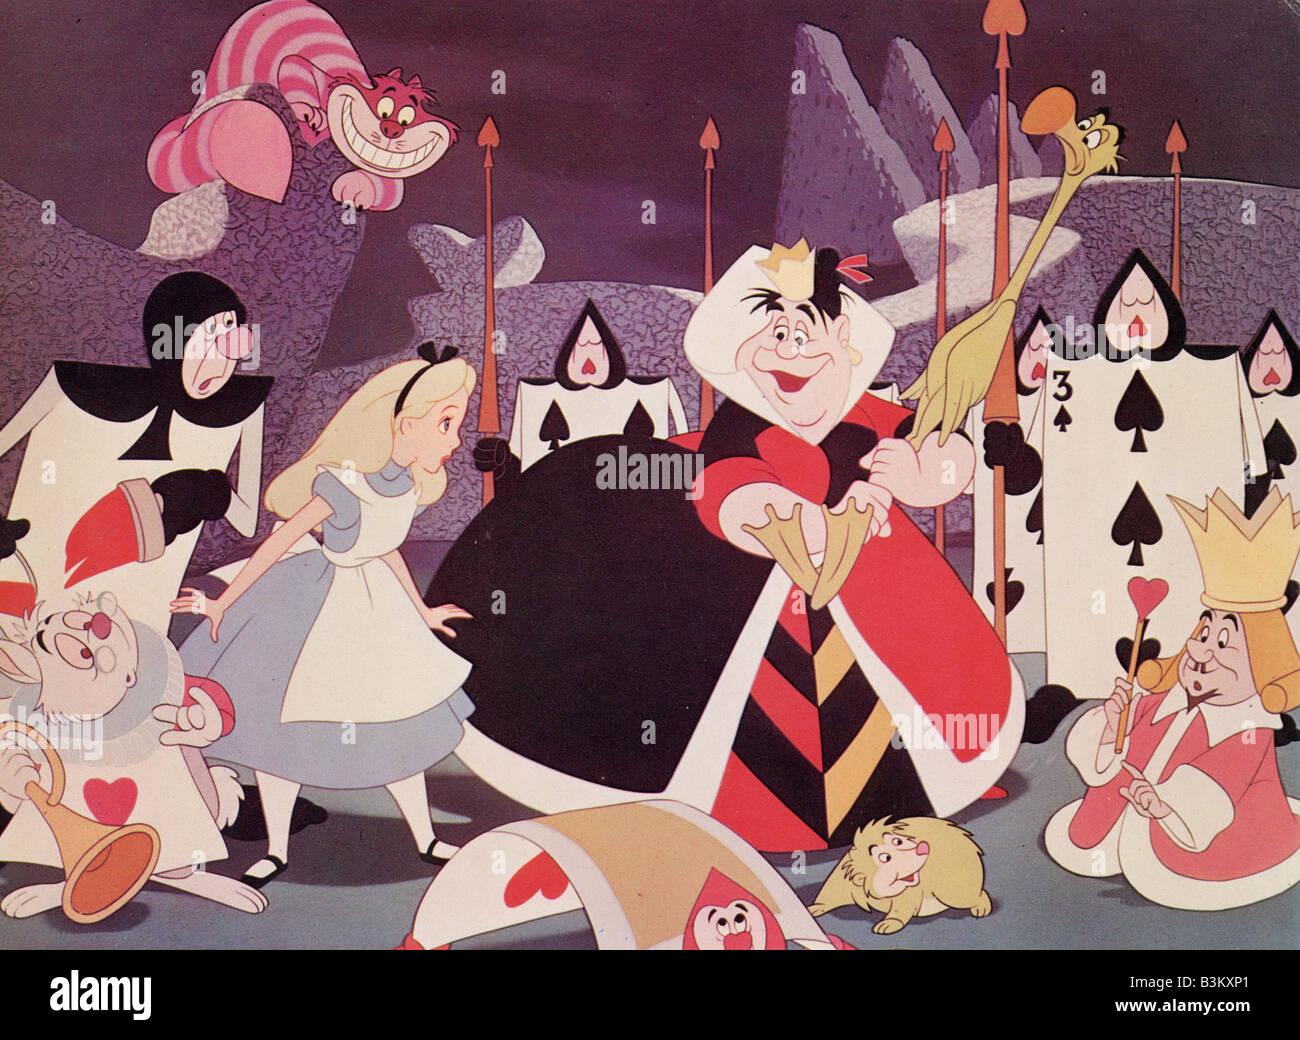 ALICE IN WONDERLAND  1951 Walt Disney cartoon - NB Walt Disney must be credited - Stock Image